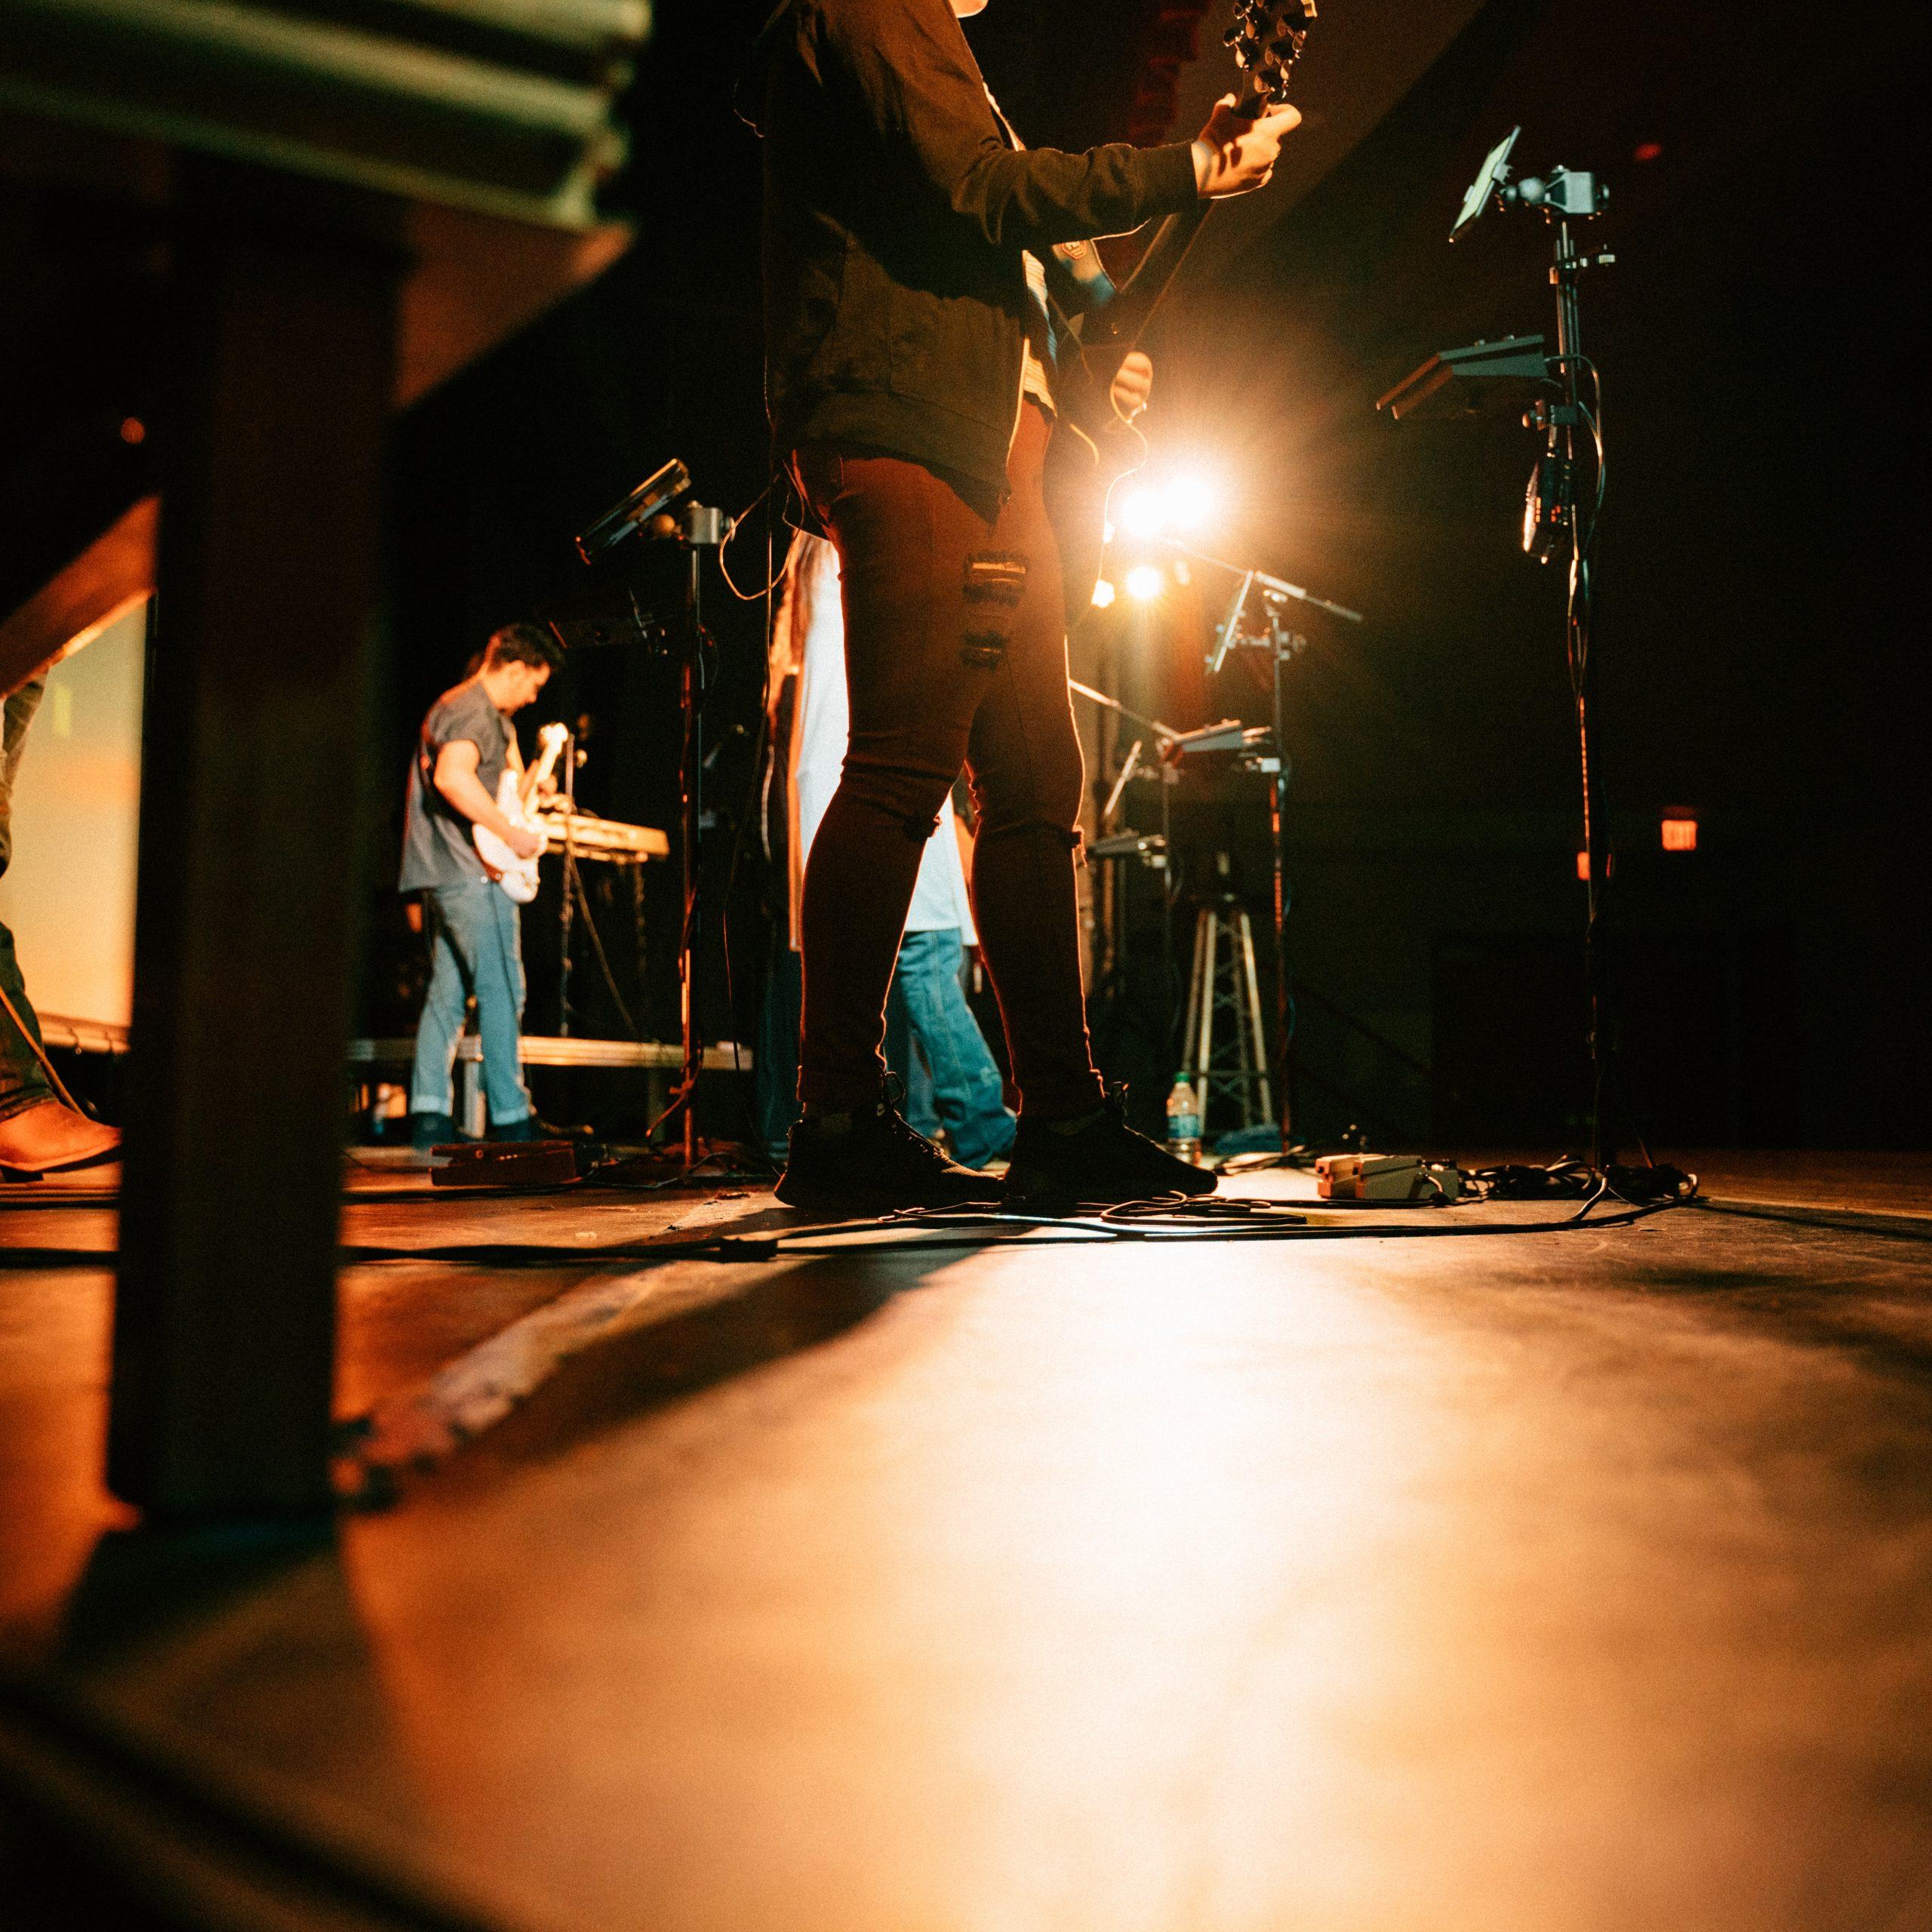 Kultura - koncert - Fot. Keagan Henman